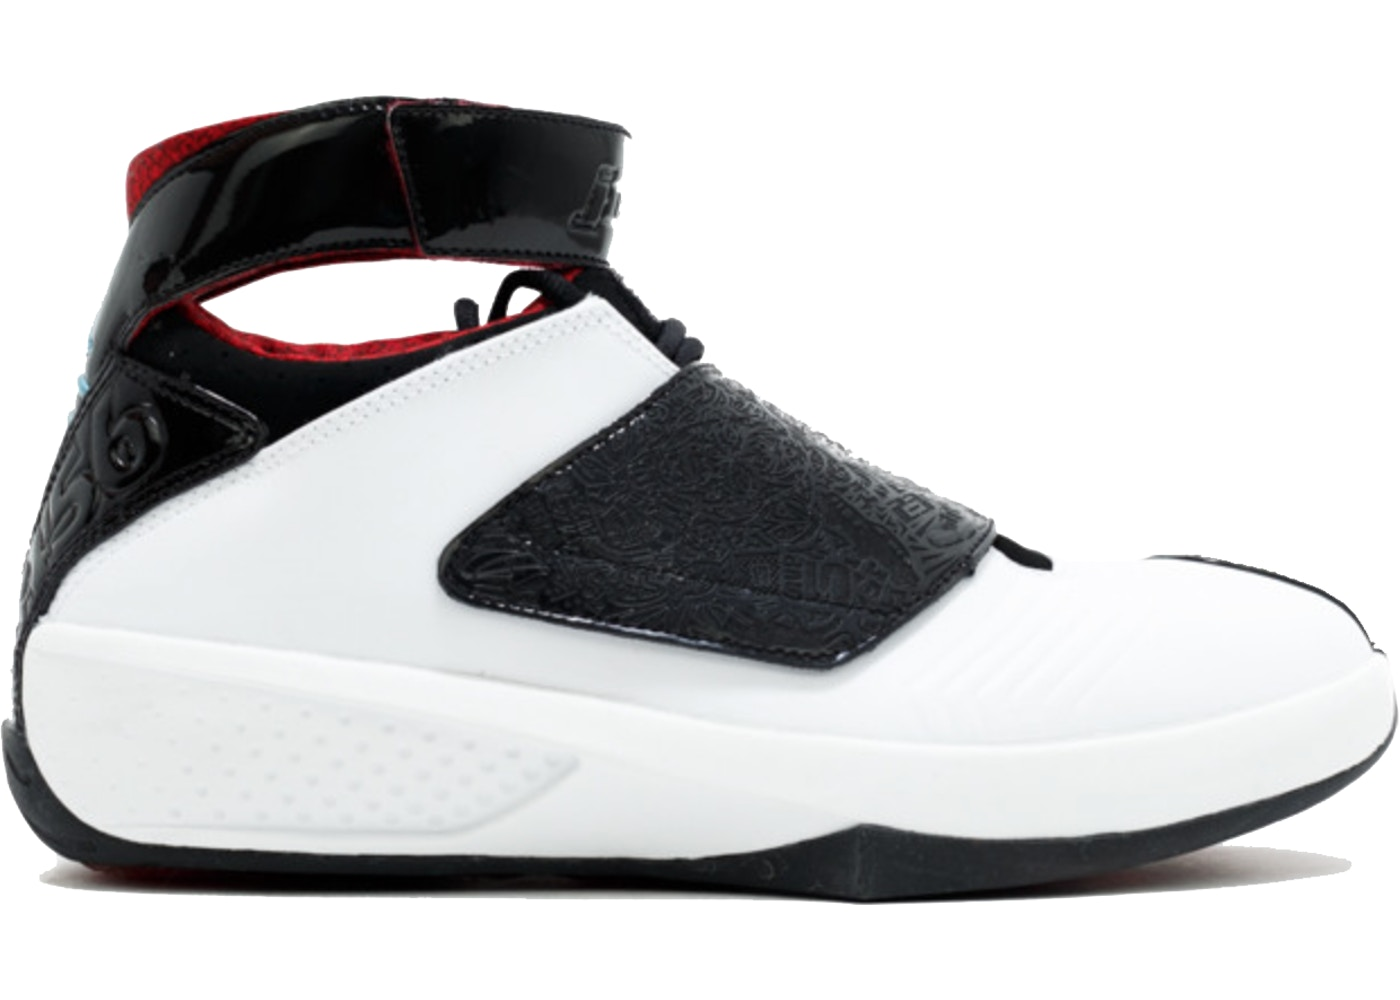 c1a2bb5c6e9a Buy Air Jordan 20 Shoes   Deadstock Sneakers